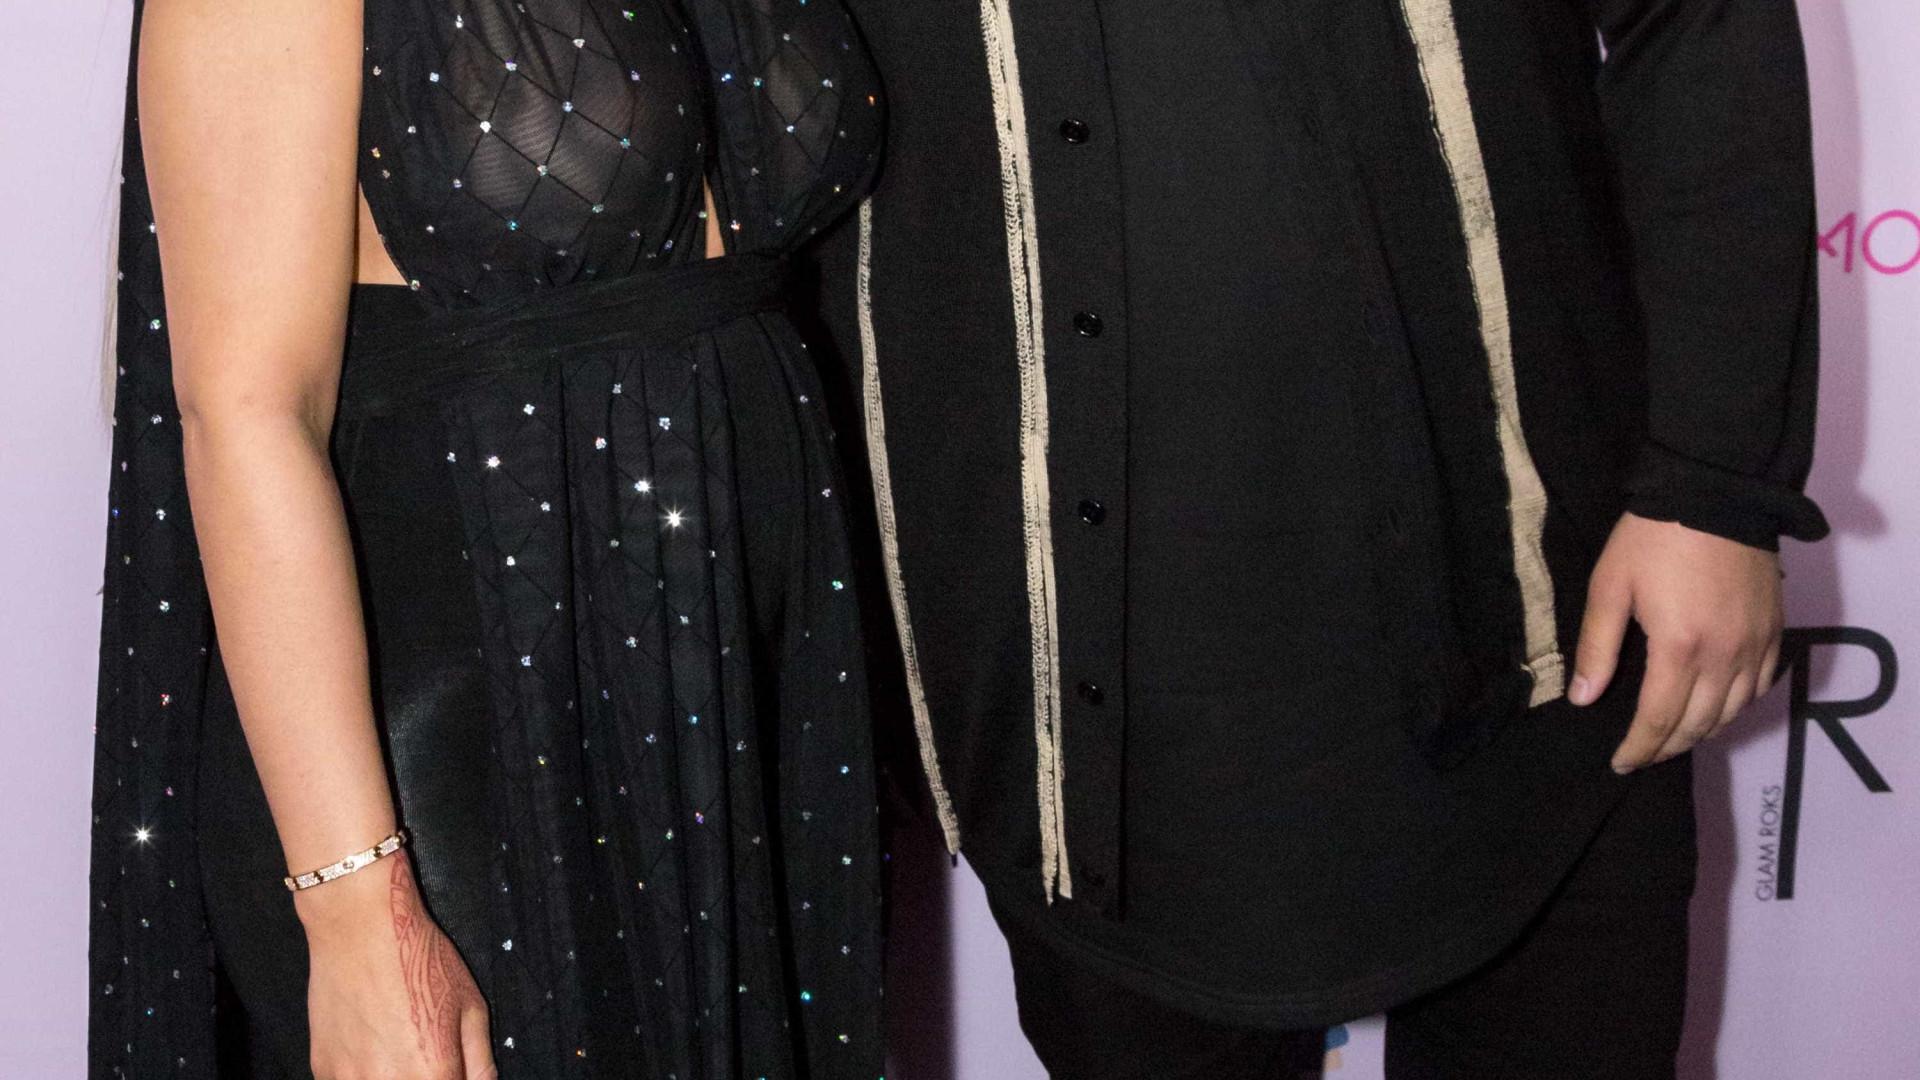 Blac Chyna está a processar toda a família Kardashian